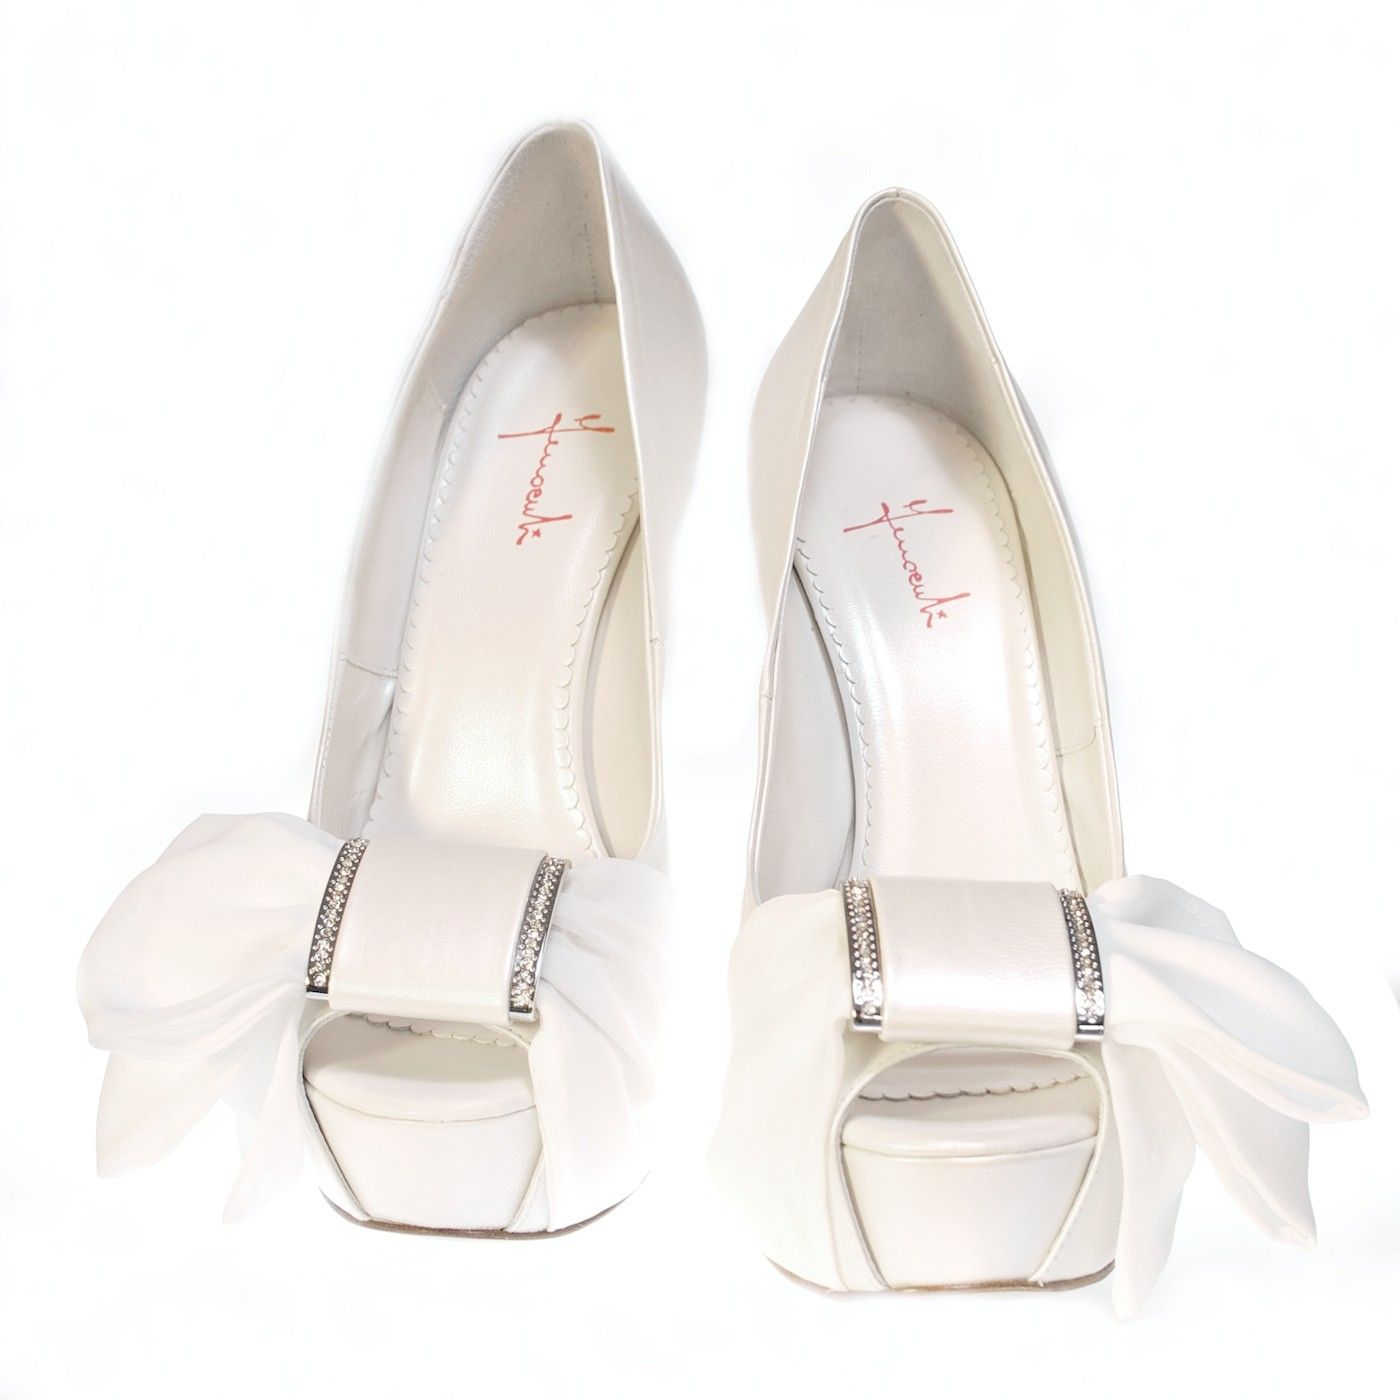 Scarpe Sposa Color Avorio.Platform Ivory Wedding Shoes With Bow Scarpe Sposa Avorio Con